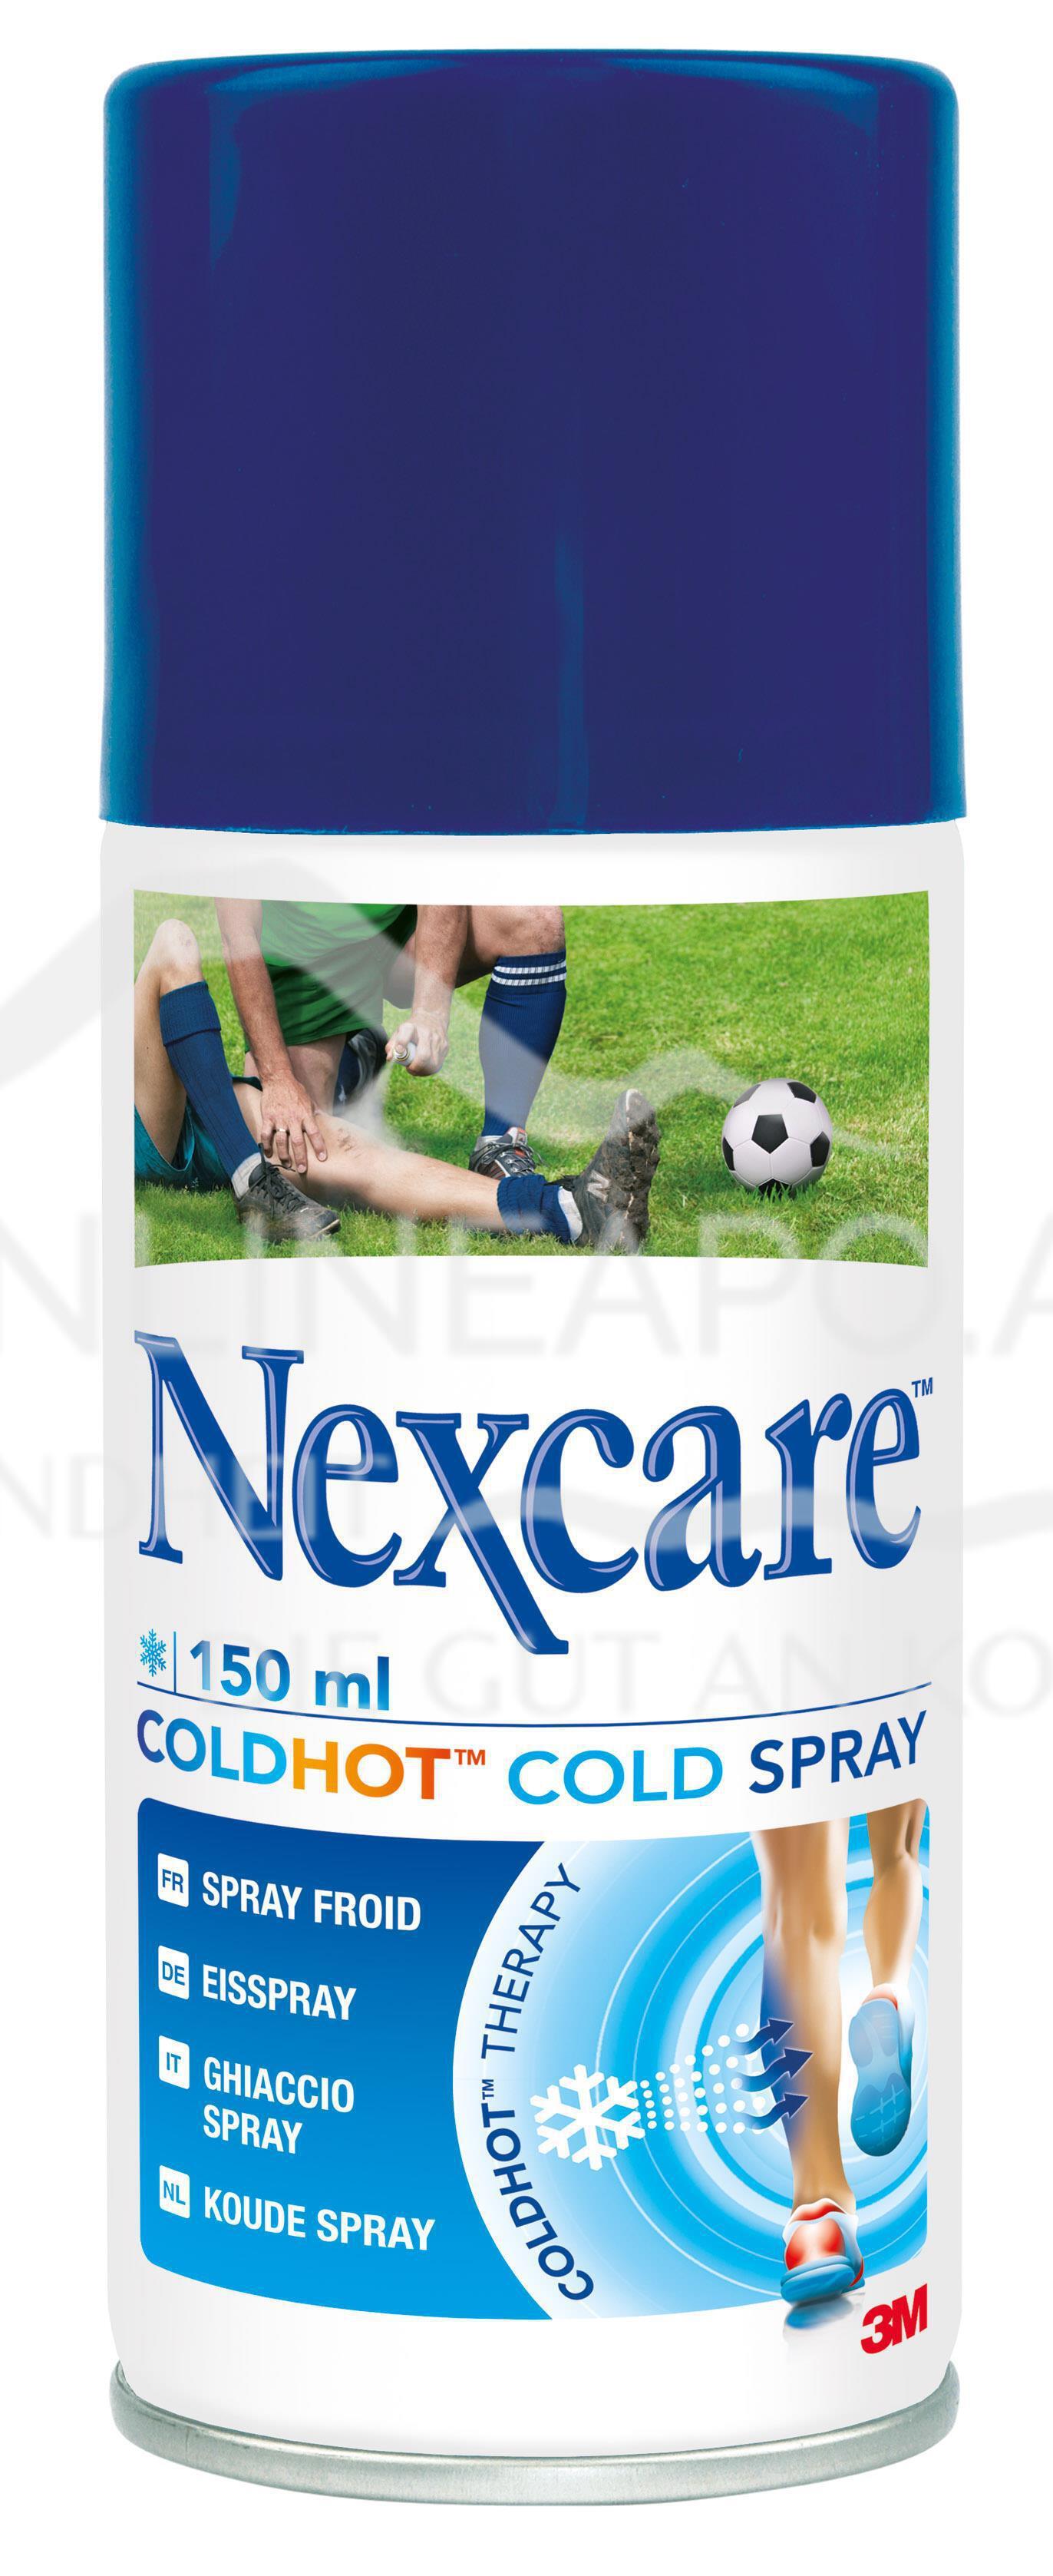 3M Nexcare ColdHot Cold Spray